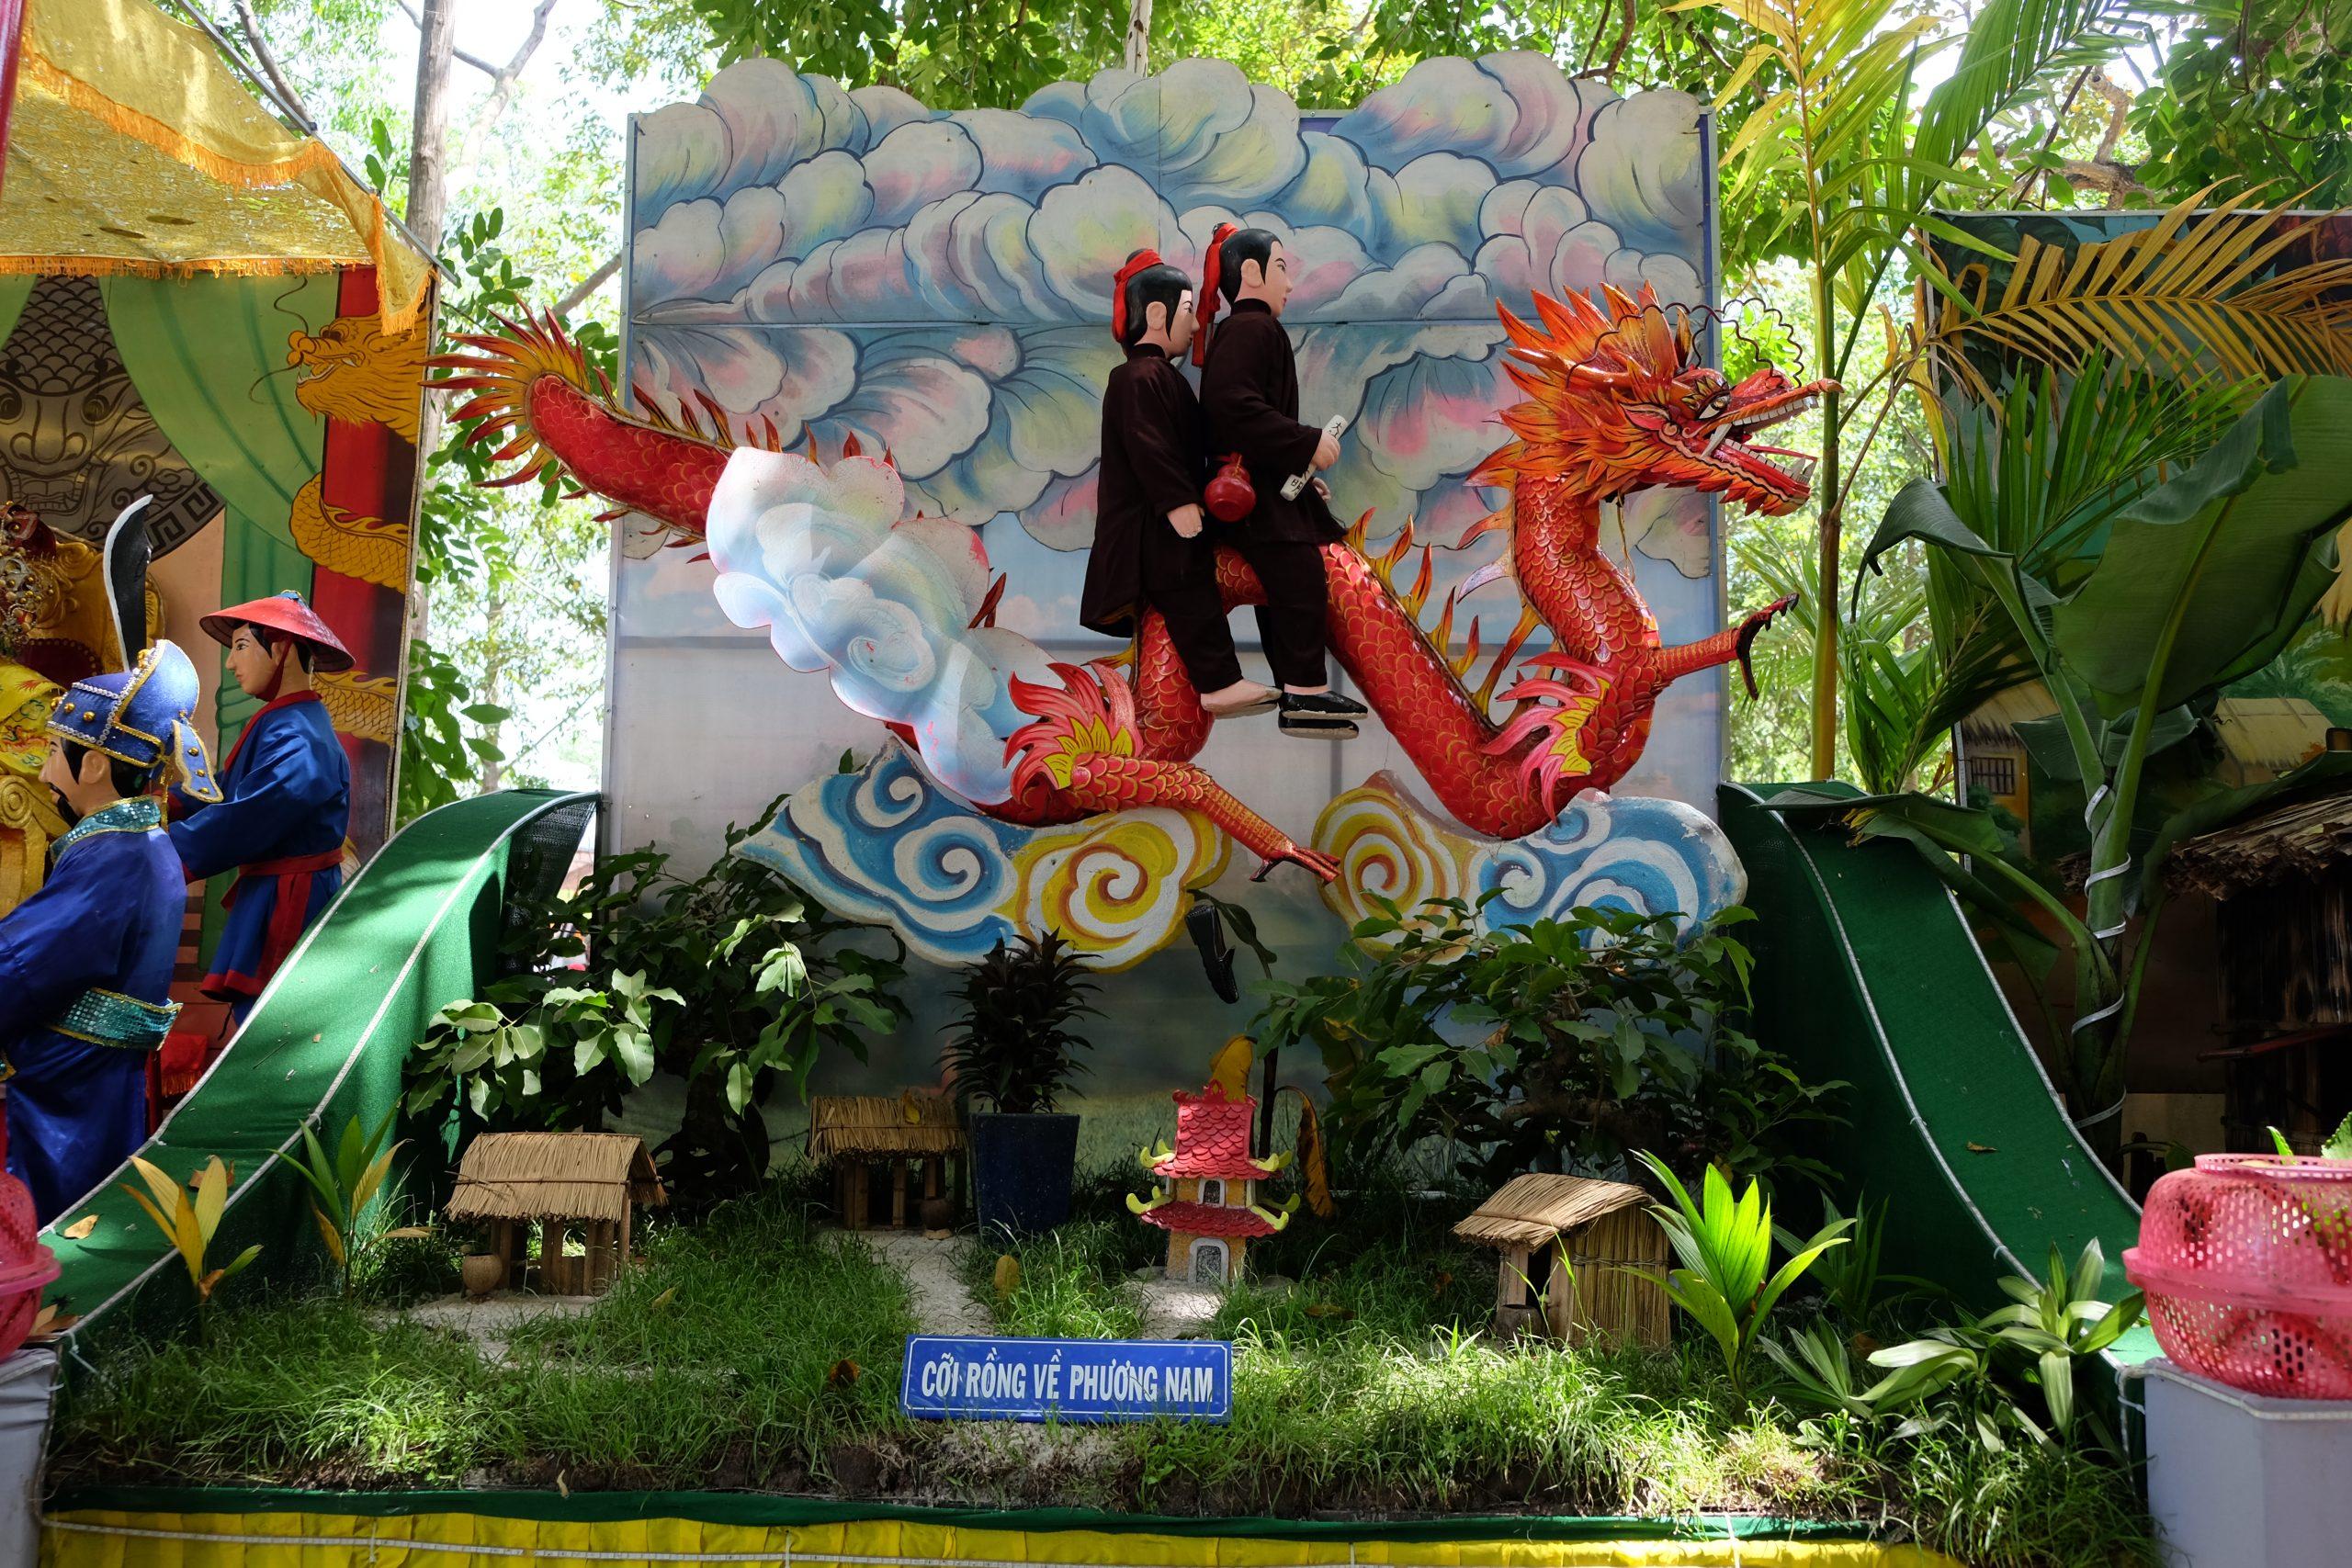 Le hoi dinh Thay Thim 2020 -04